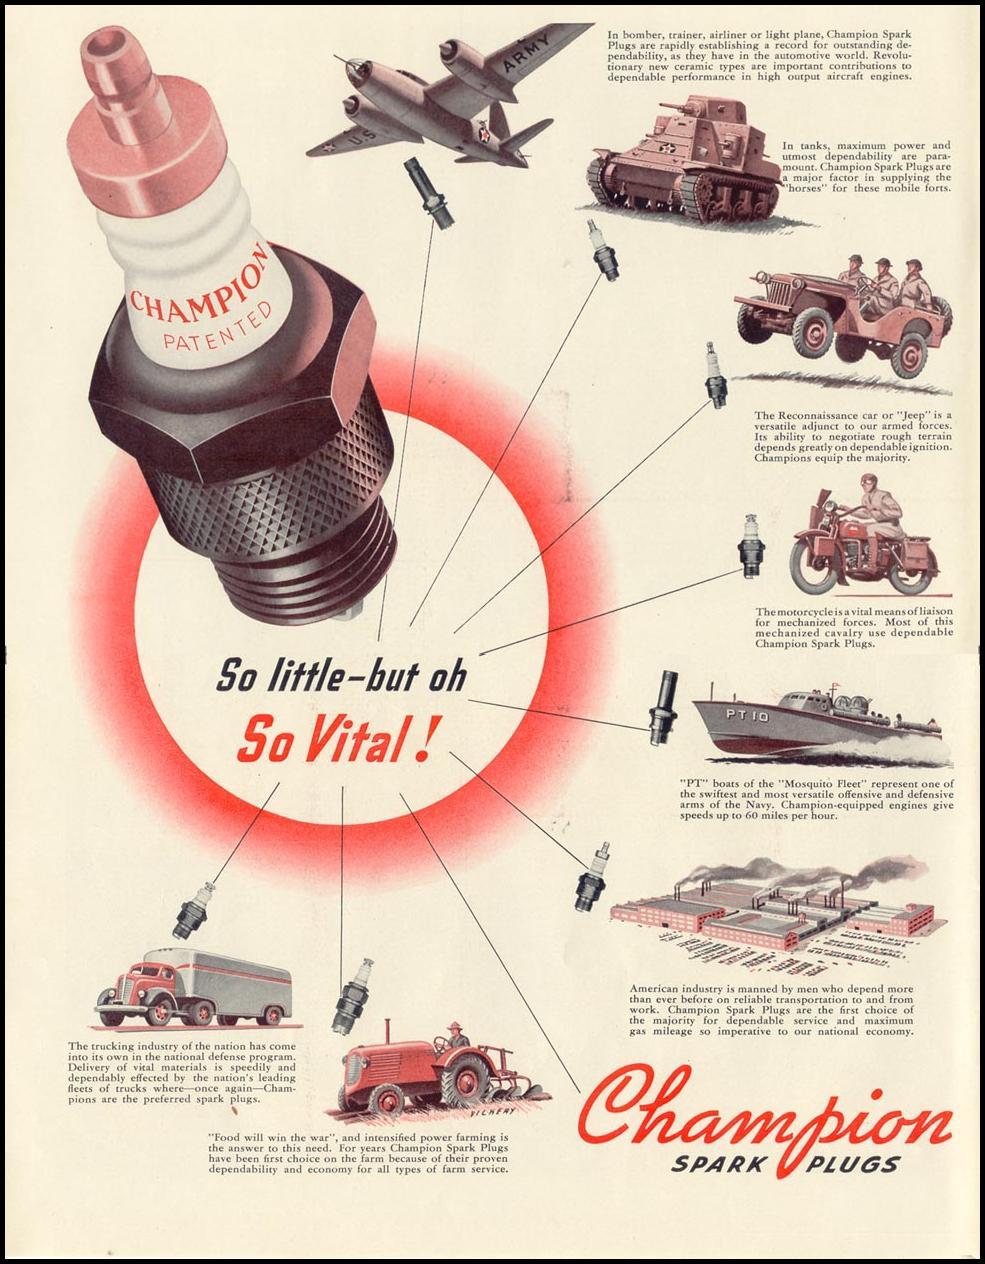 CHAMPION SPARK PLUGS LIFE 10/13/1941